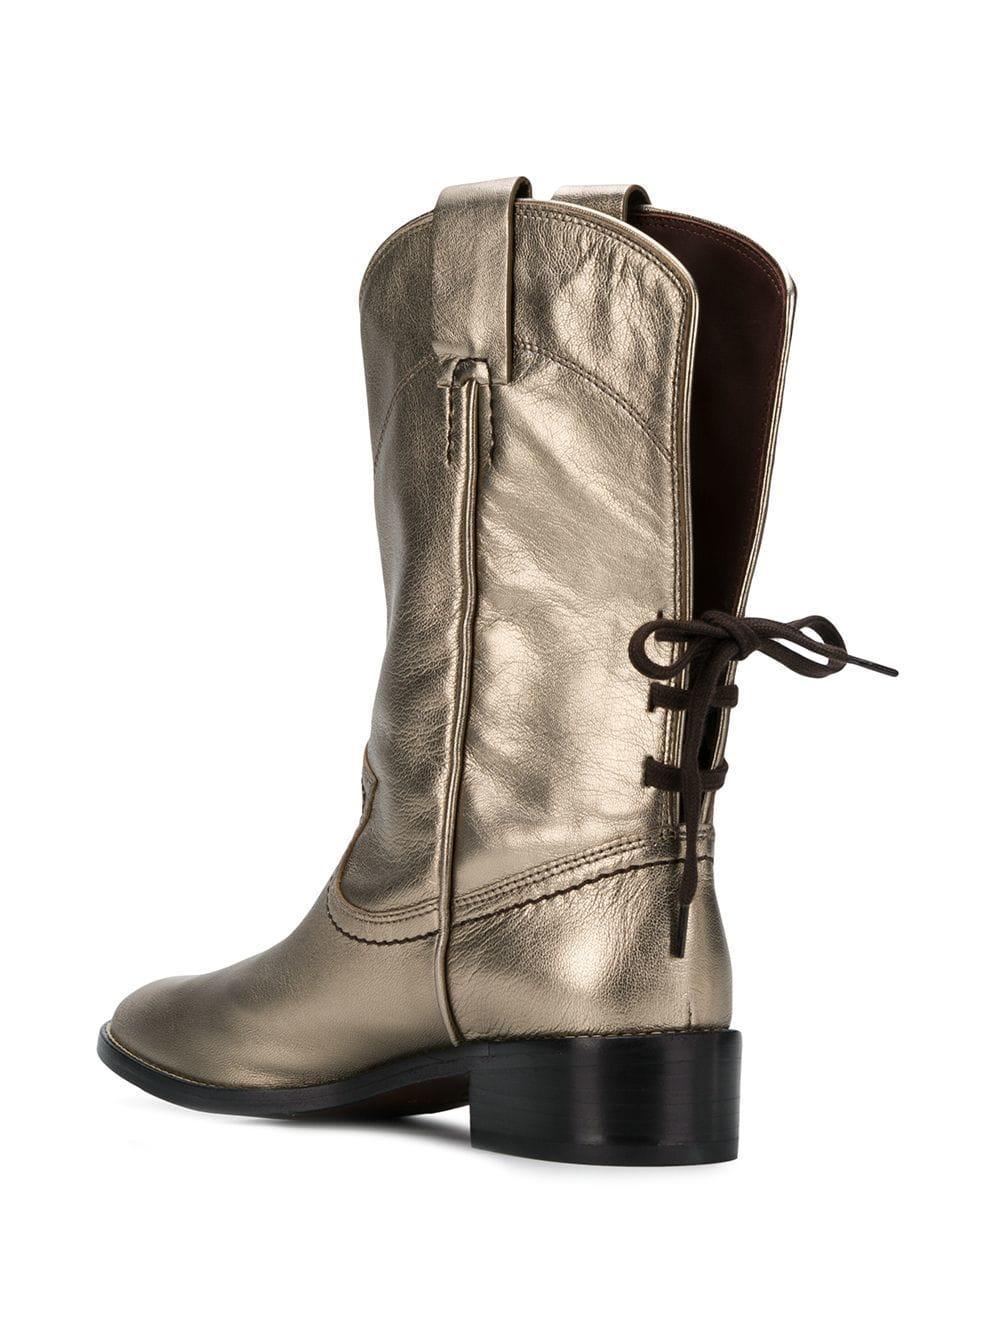 See Chloé By Mid In Calf Boots Lyst Cowboy Metallic Inspired qaRxRSU